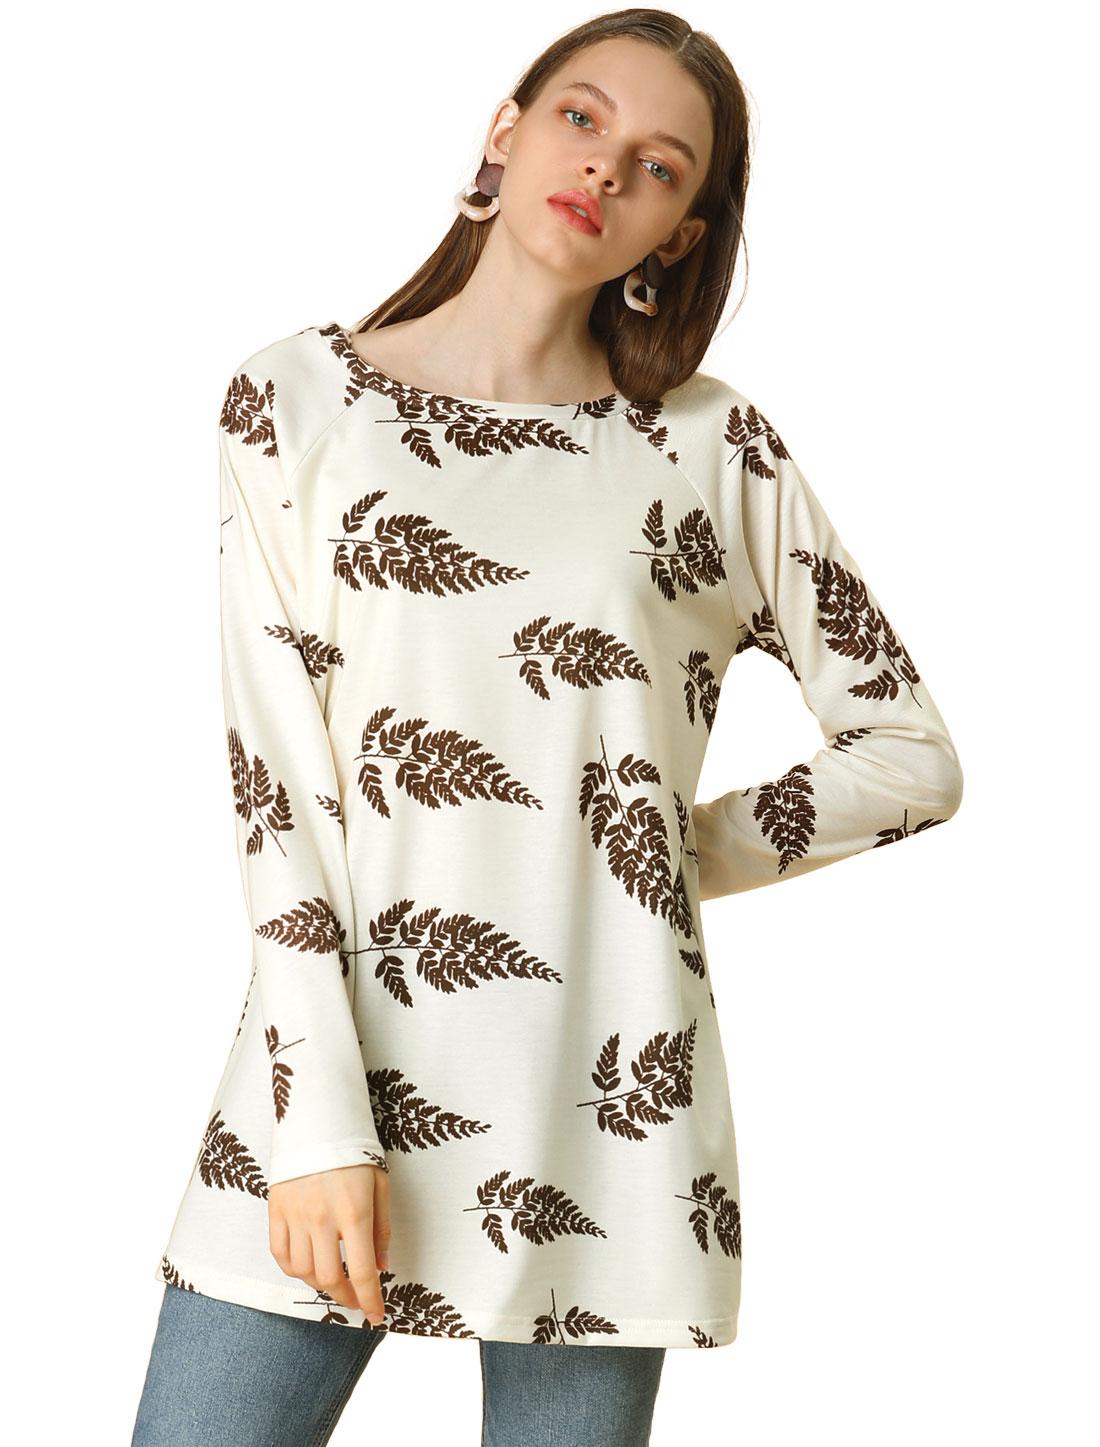 Allegra K Women's Leaf Print Raglan Tunic Top White M (US 10)